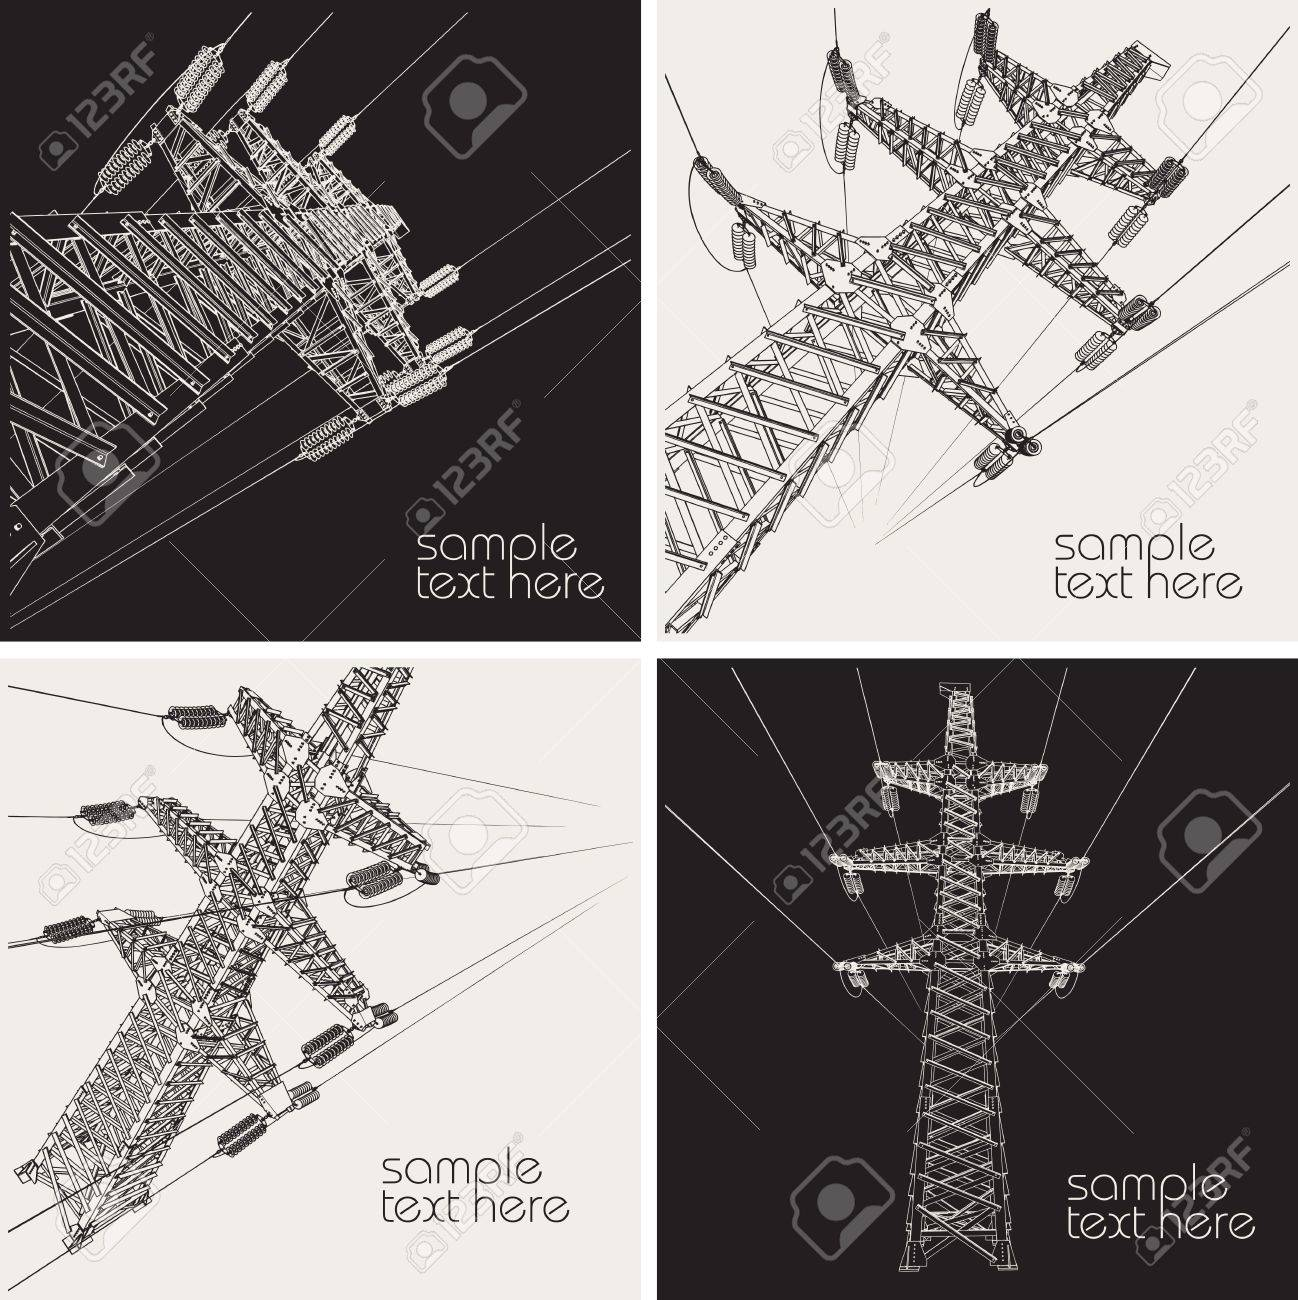 Power Transmission Line, vector illustration - 17049788